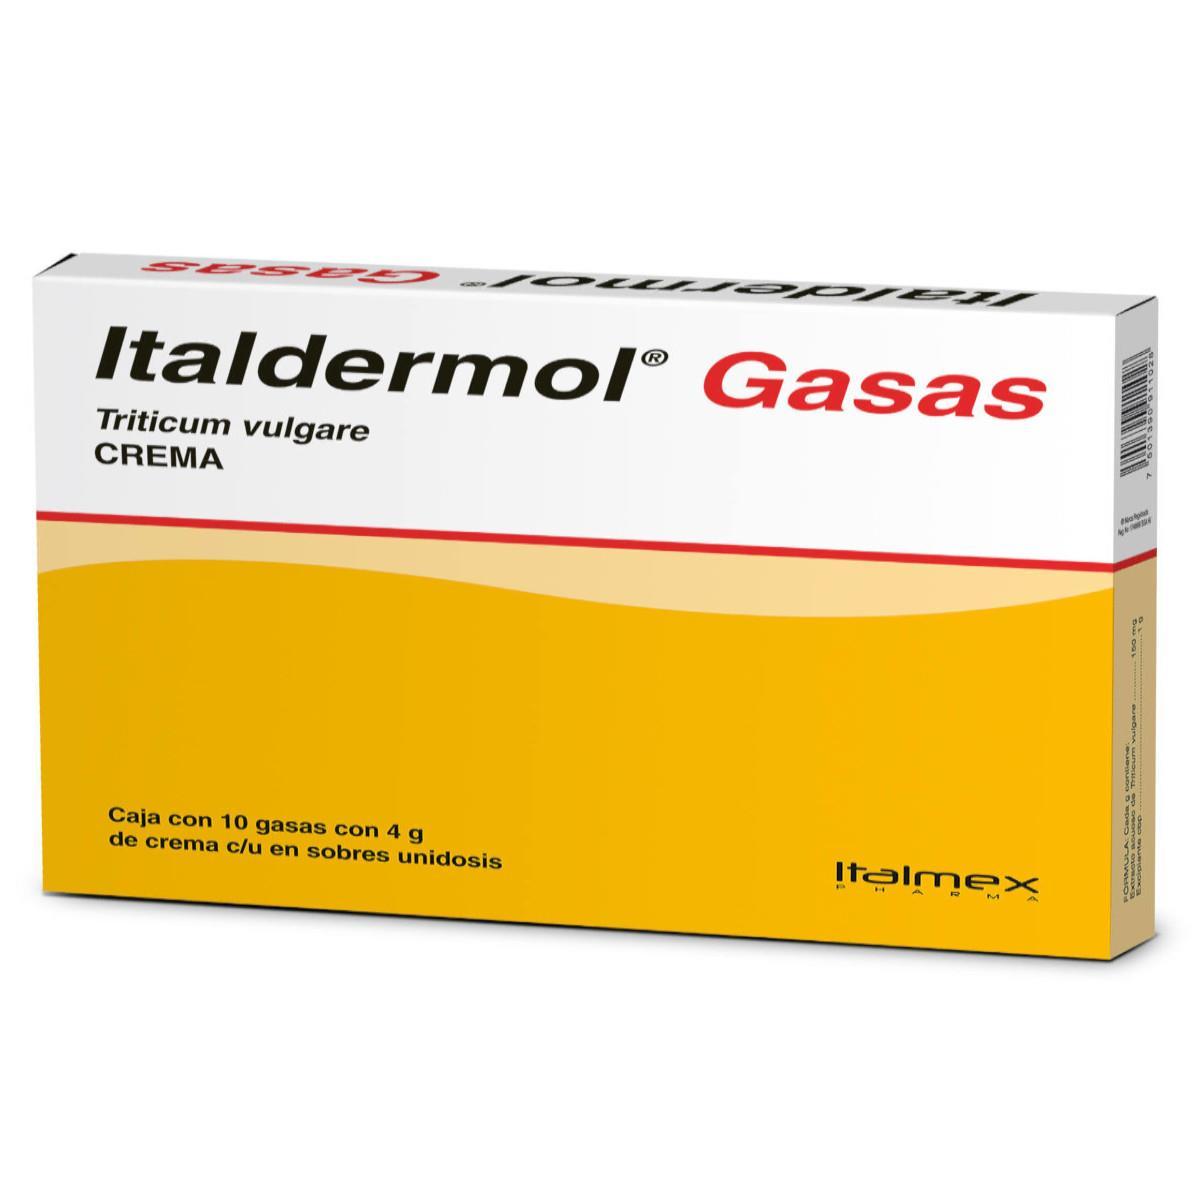 Comprar Italdermol Gasa Cre 40 Gr Caja